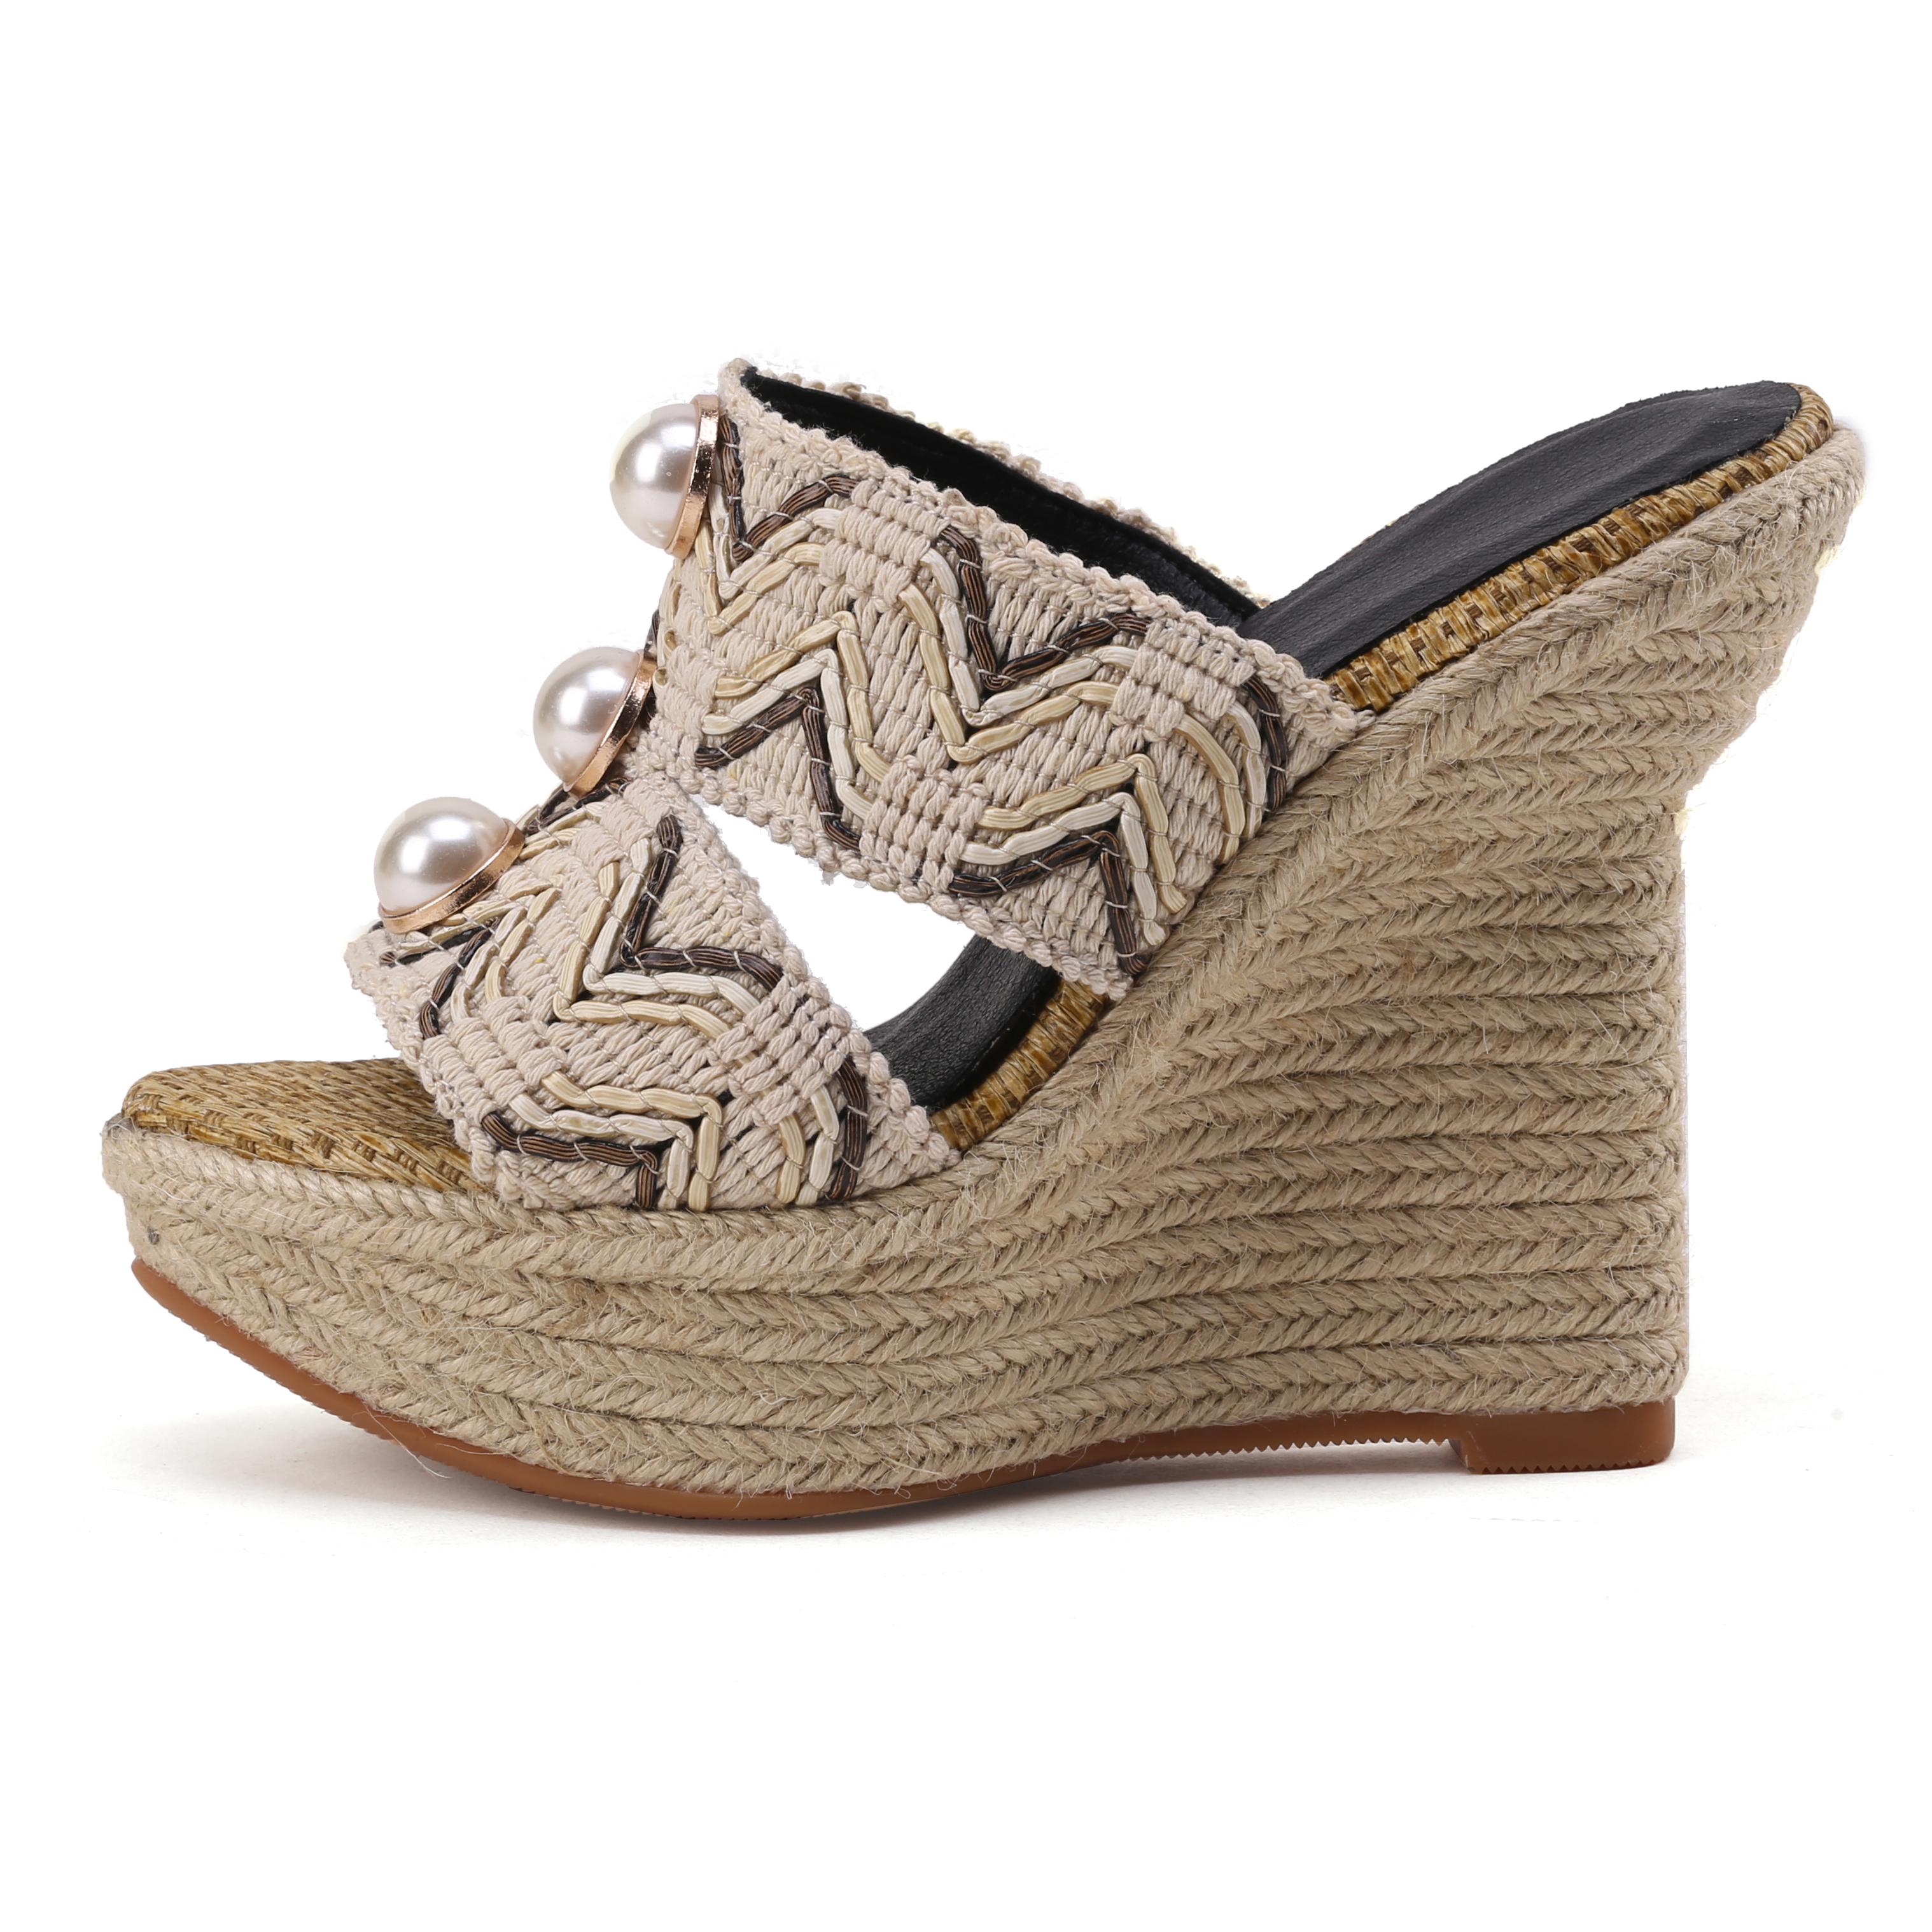 9e8dec74d12 US  45 - 2018 summer high heels wedges platform peep toe women s shoes  slippers - www.ardenfurtado.com